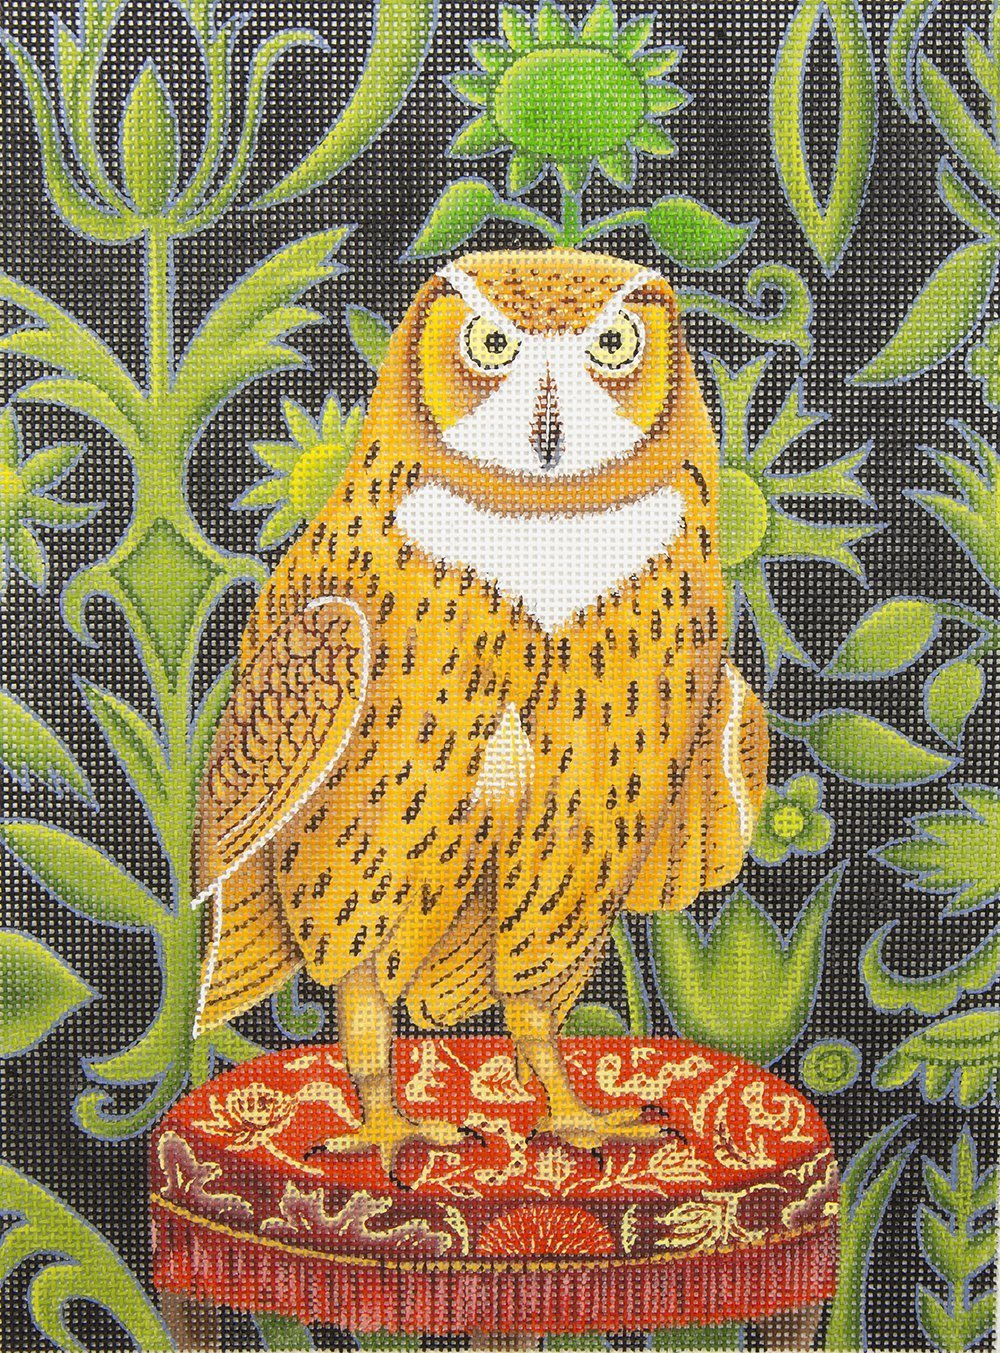 JM1501 Owl on Stool Julie Mar & Friends